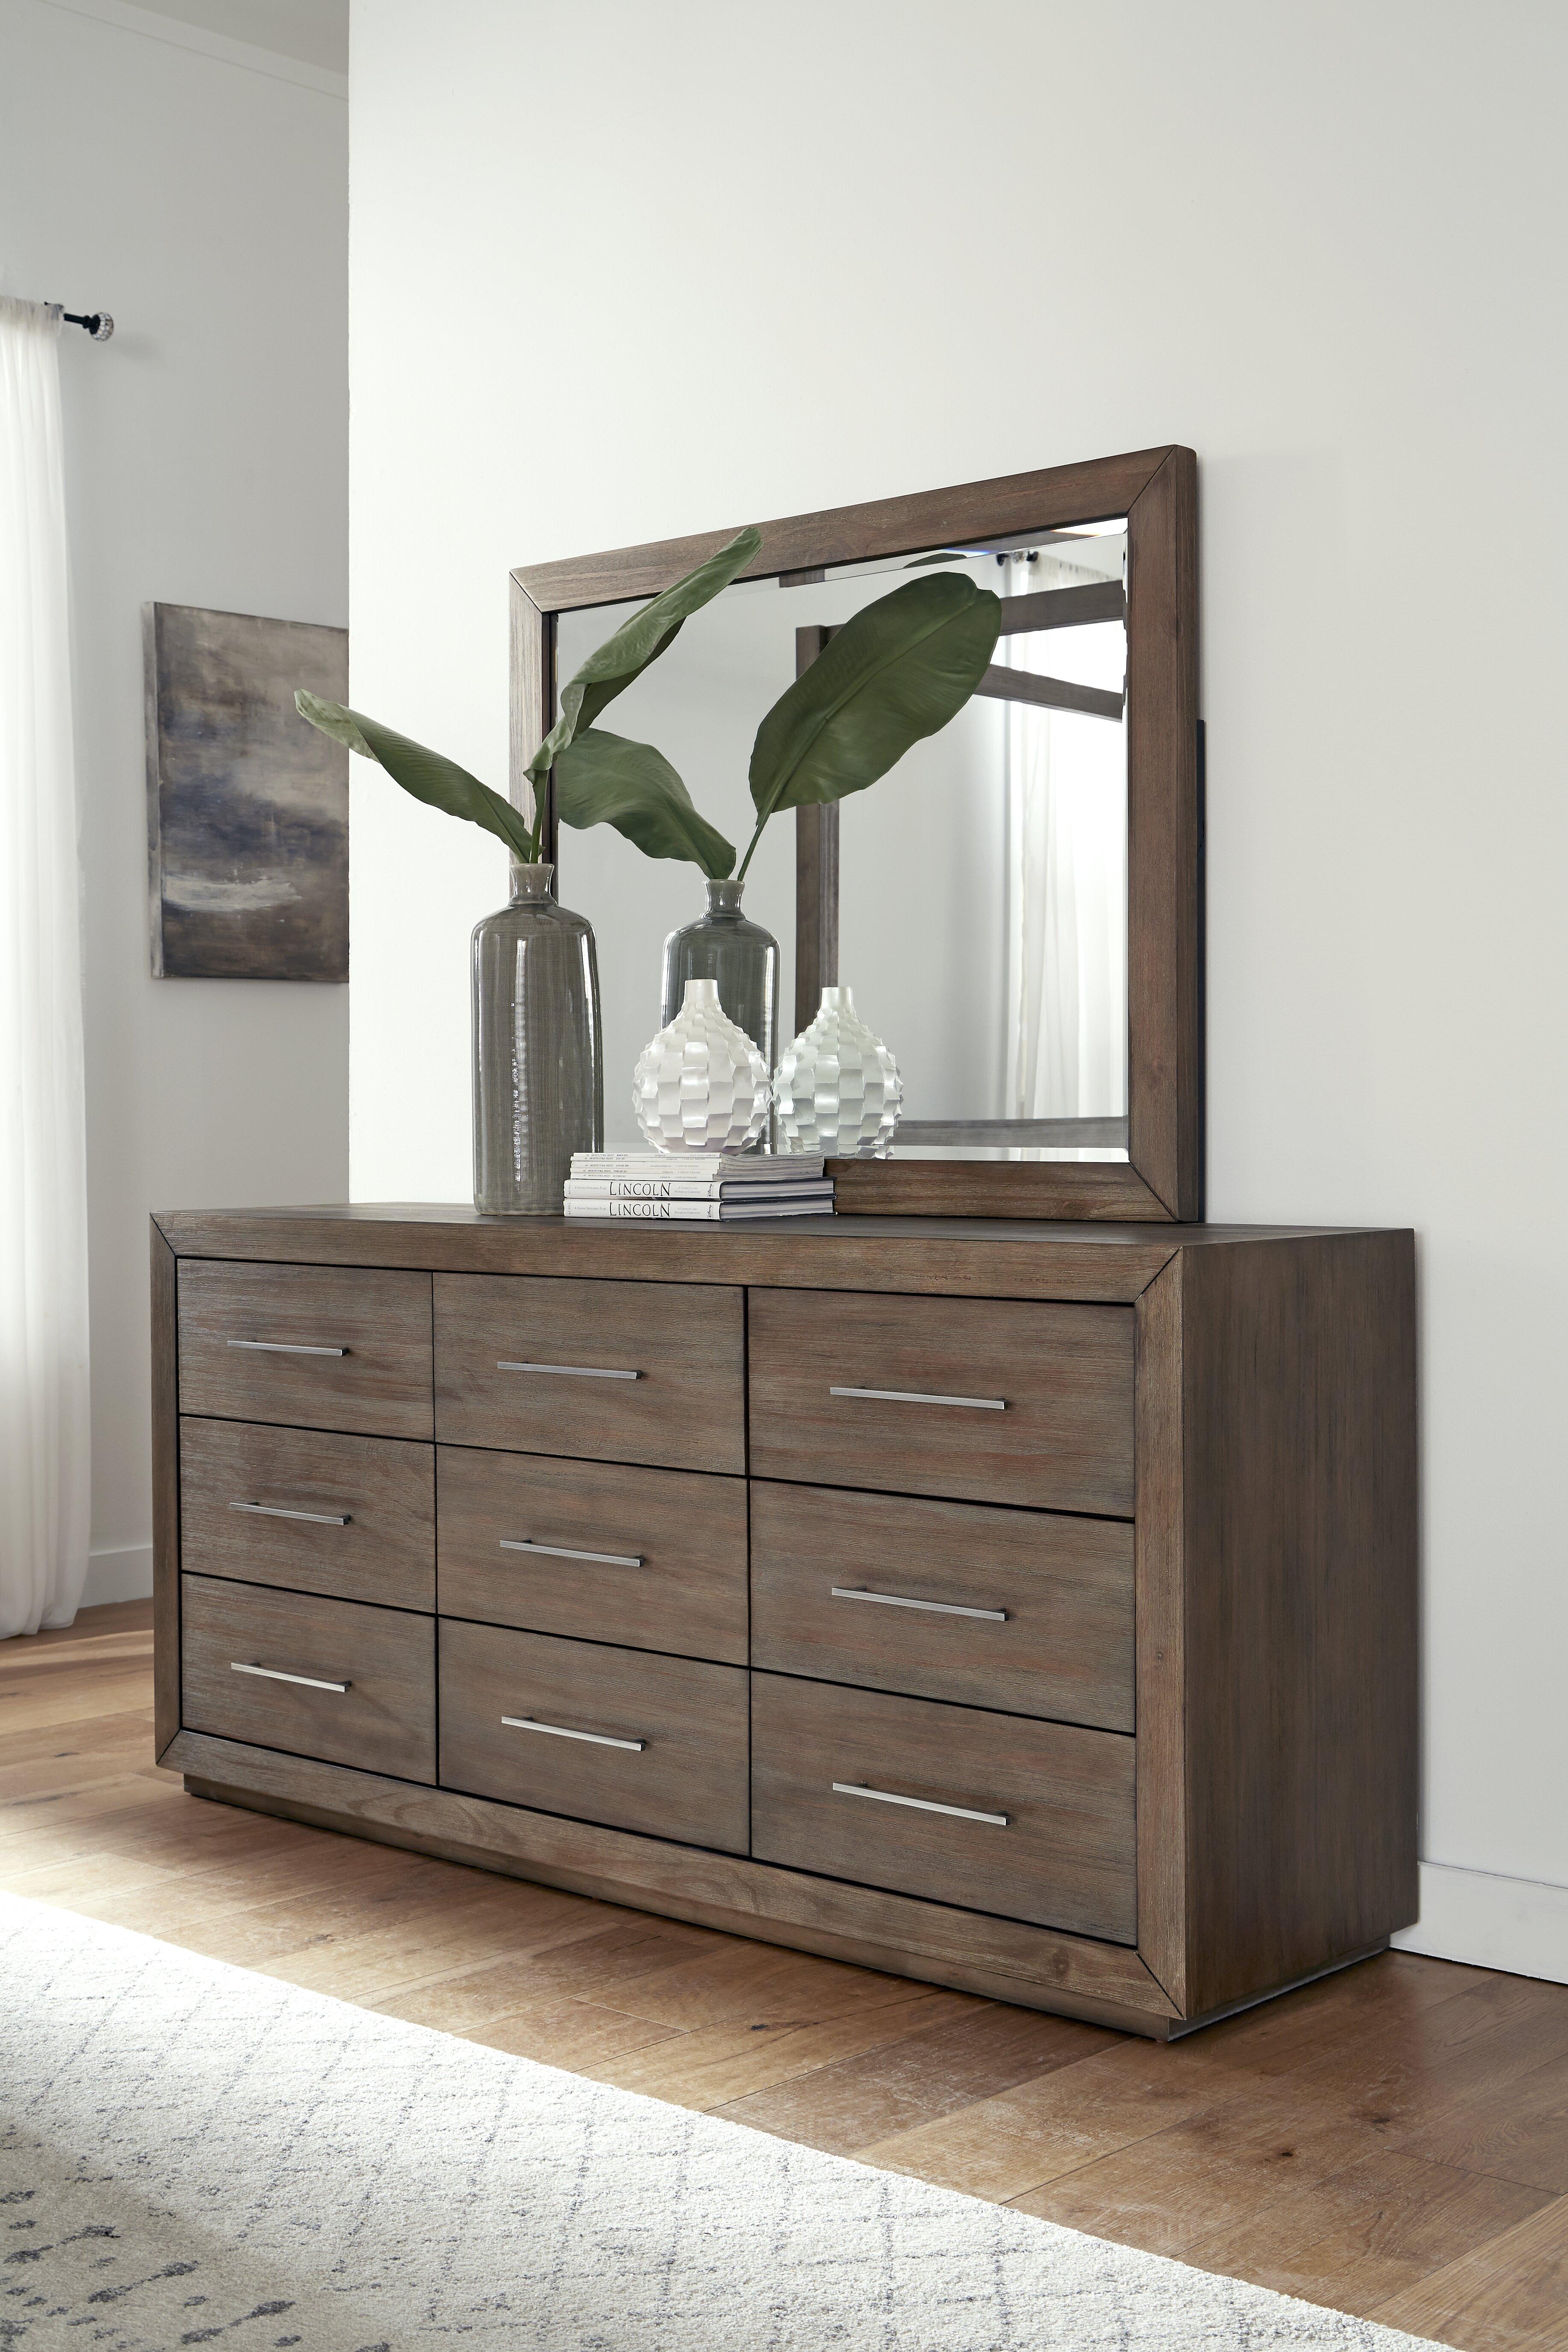 Arruda 9 Drawer Double Dresser With Mirror Reviews Joss Main